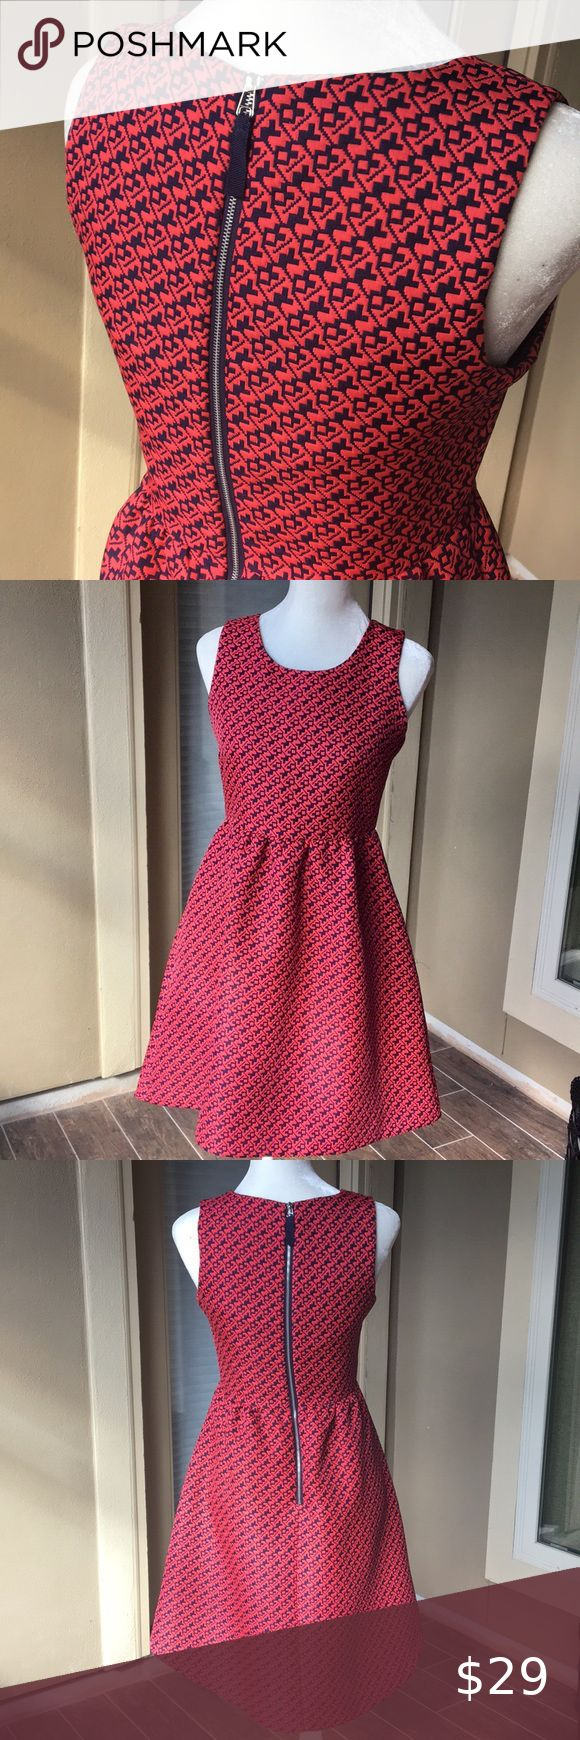 lili wang for lilis closet dress dress closet clothes design dresses